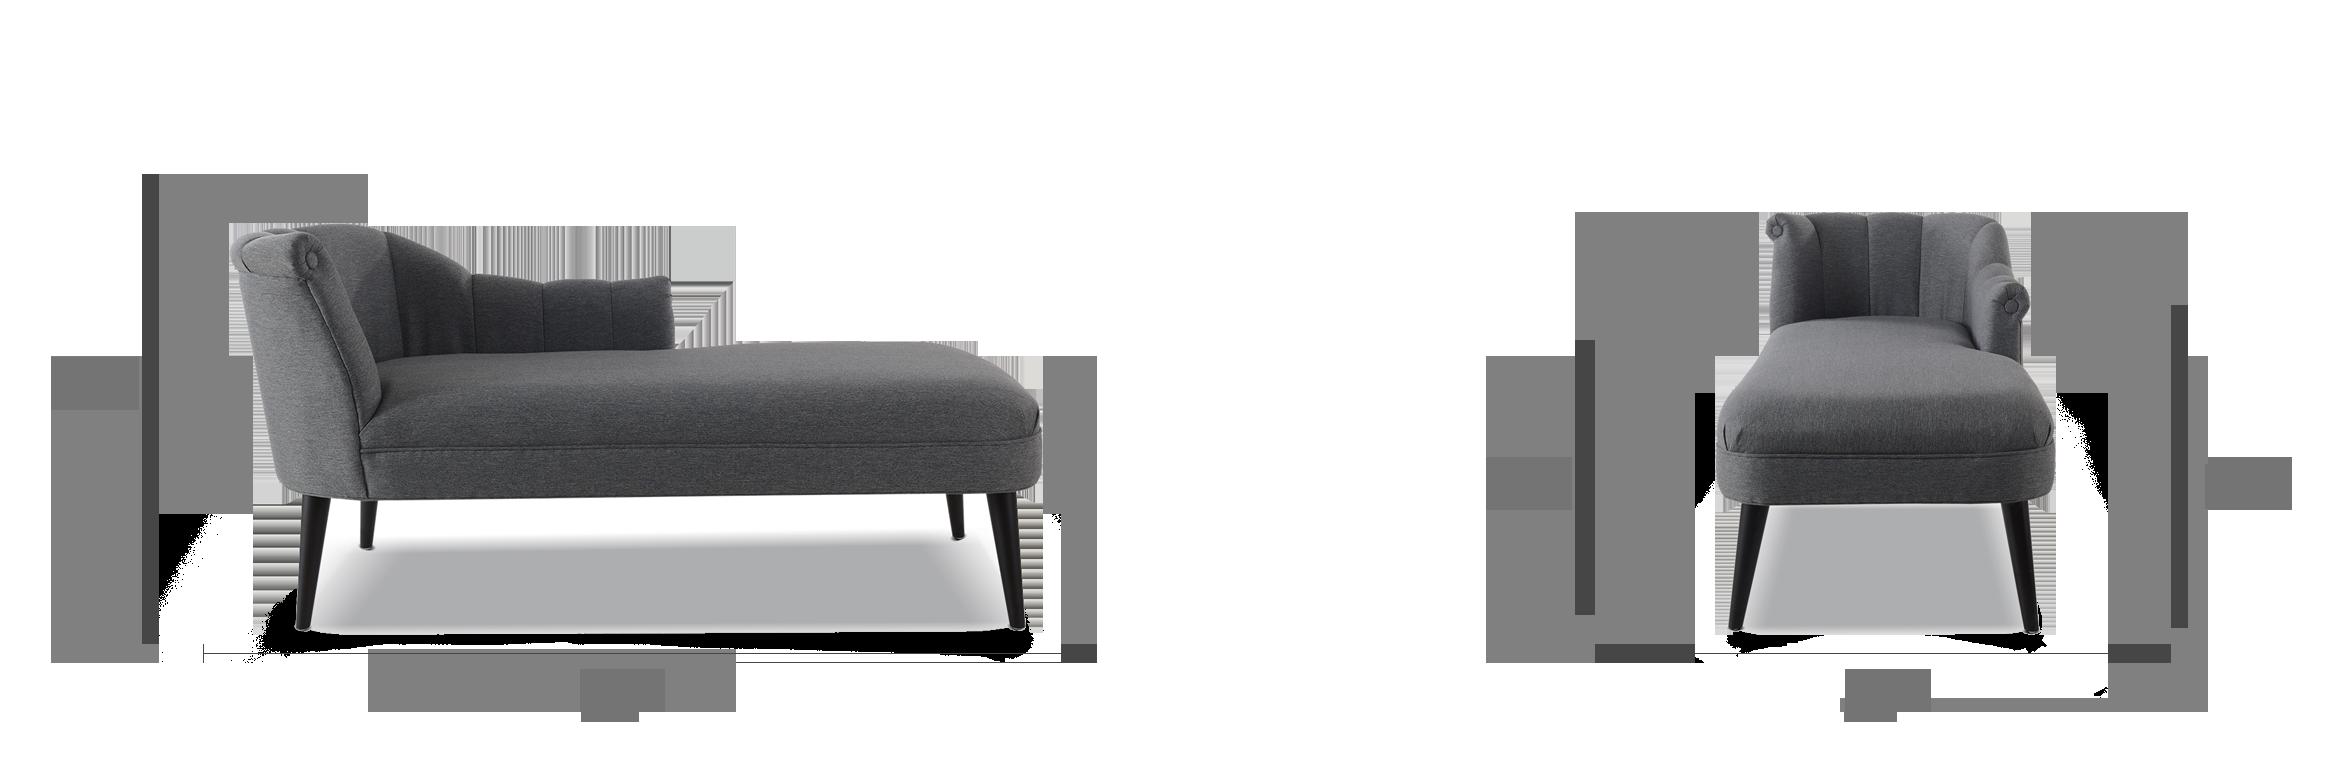 Florentine Chaise Lounge